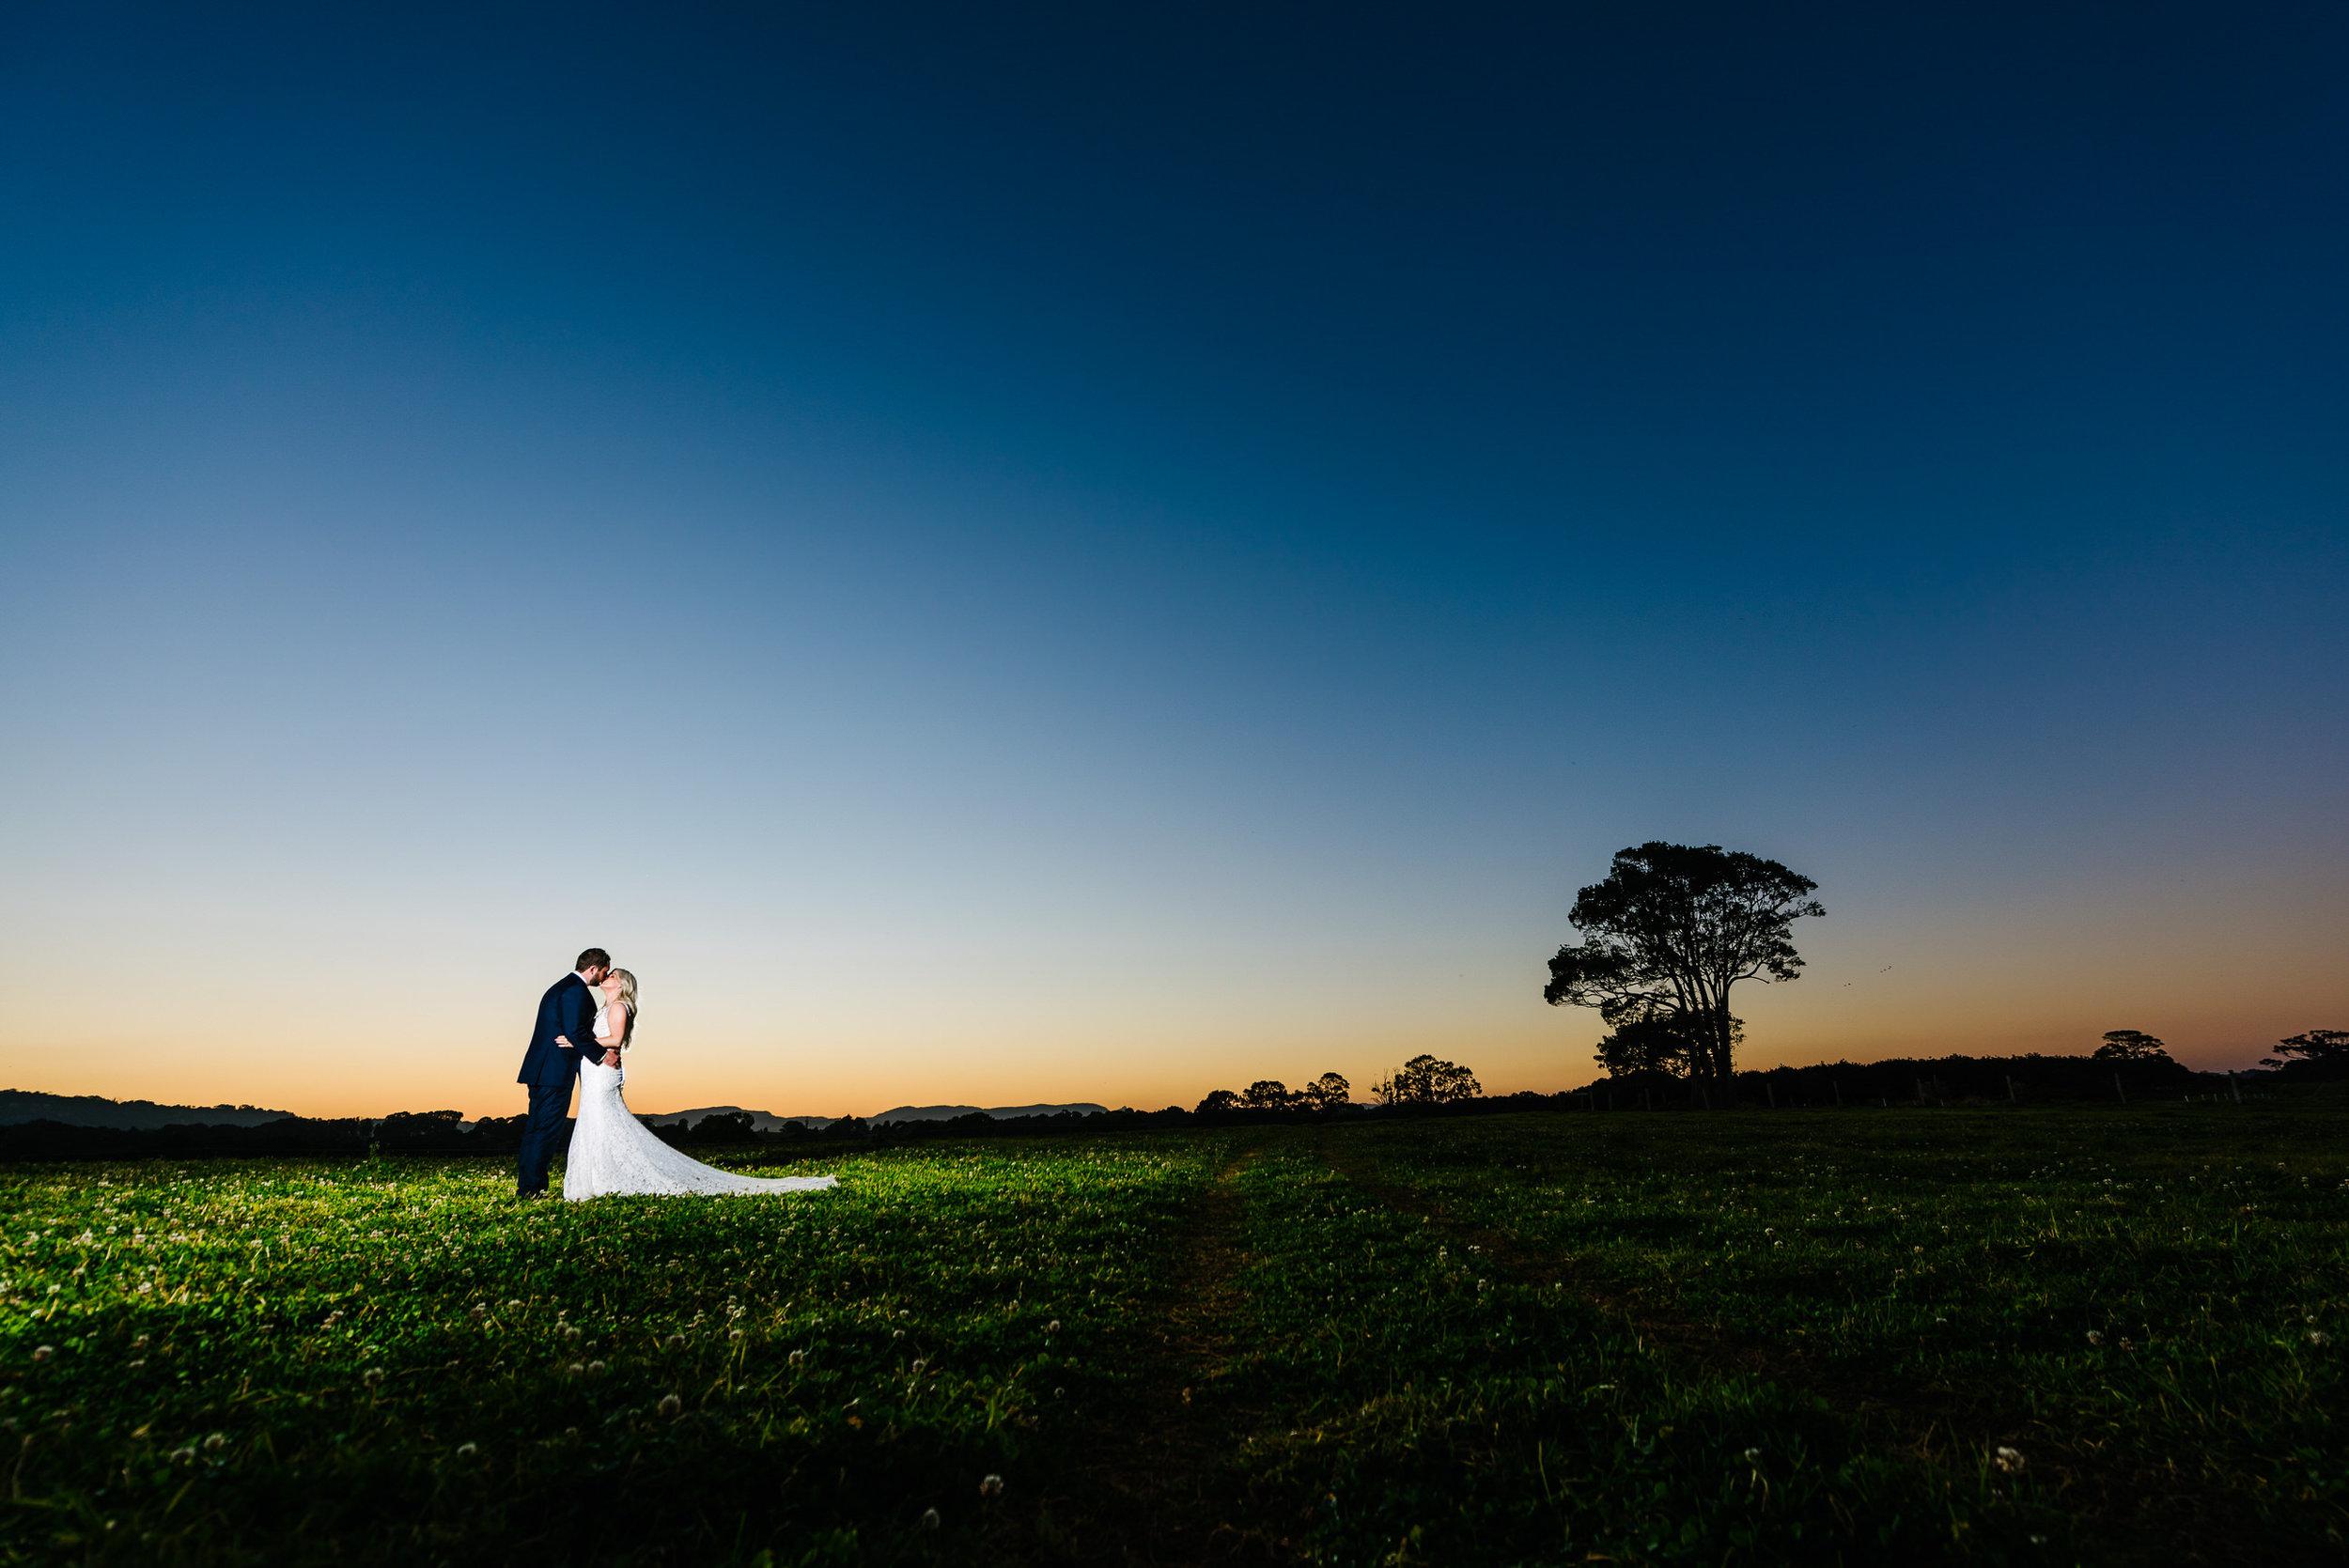 Justin_And_Jim_Photography_Byron_Bay_Wedding089.JPG